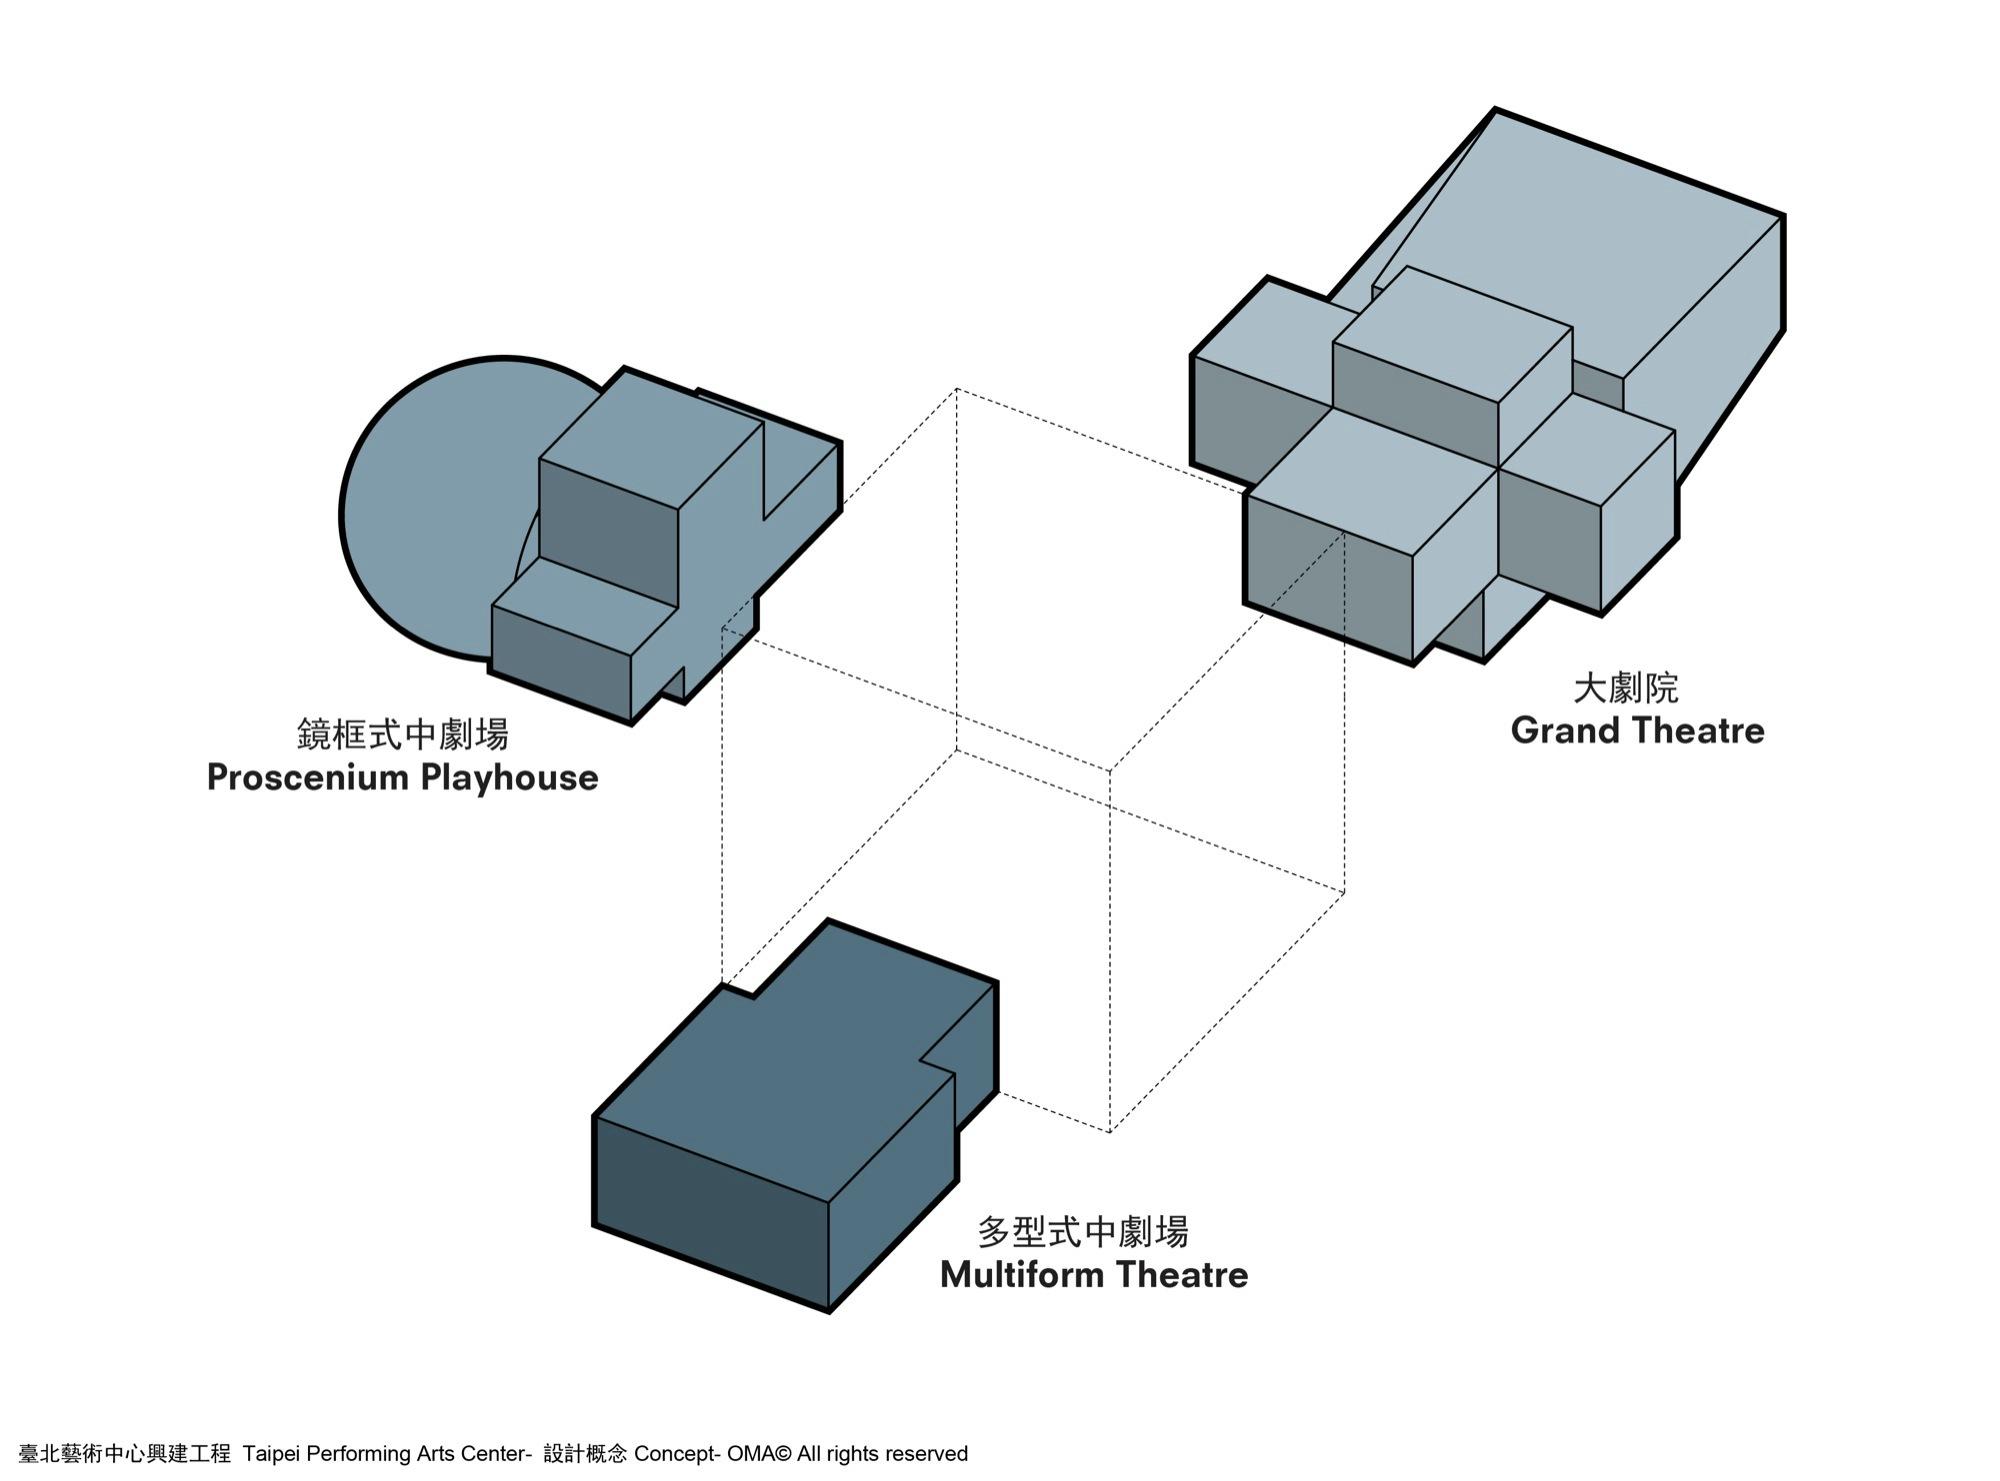 Hd wallpapers oma diagrams desktopandroidfbe get free high quality hd wallpapers oma diagrams pooptronica Choice Image